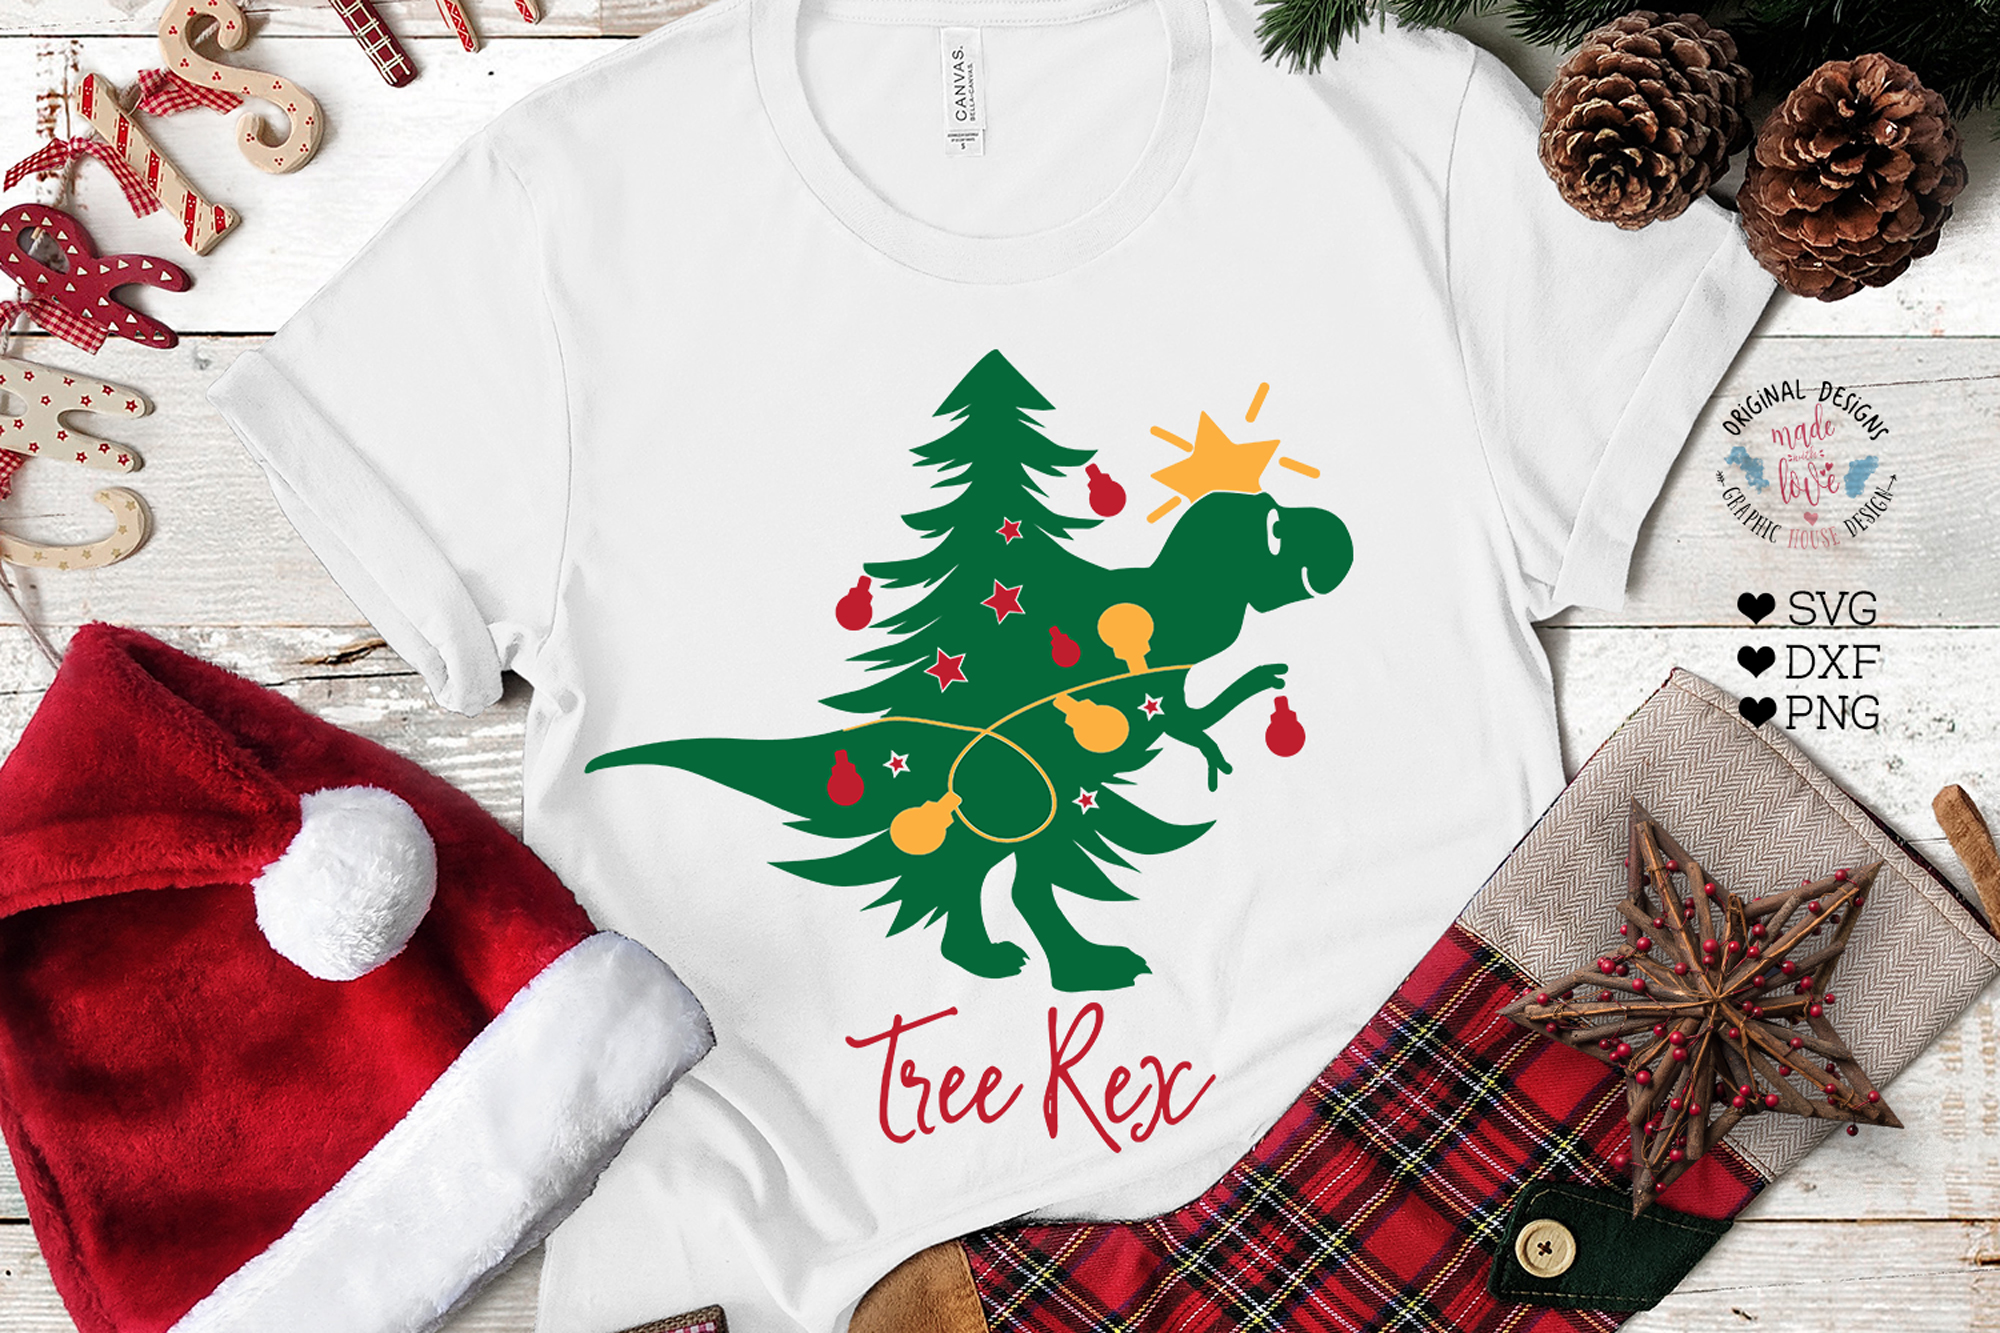 Tree Rex - Christmas Kids T-Shirt Cut File example image 1